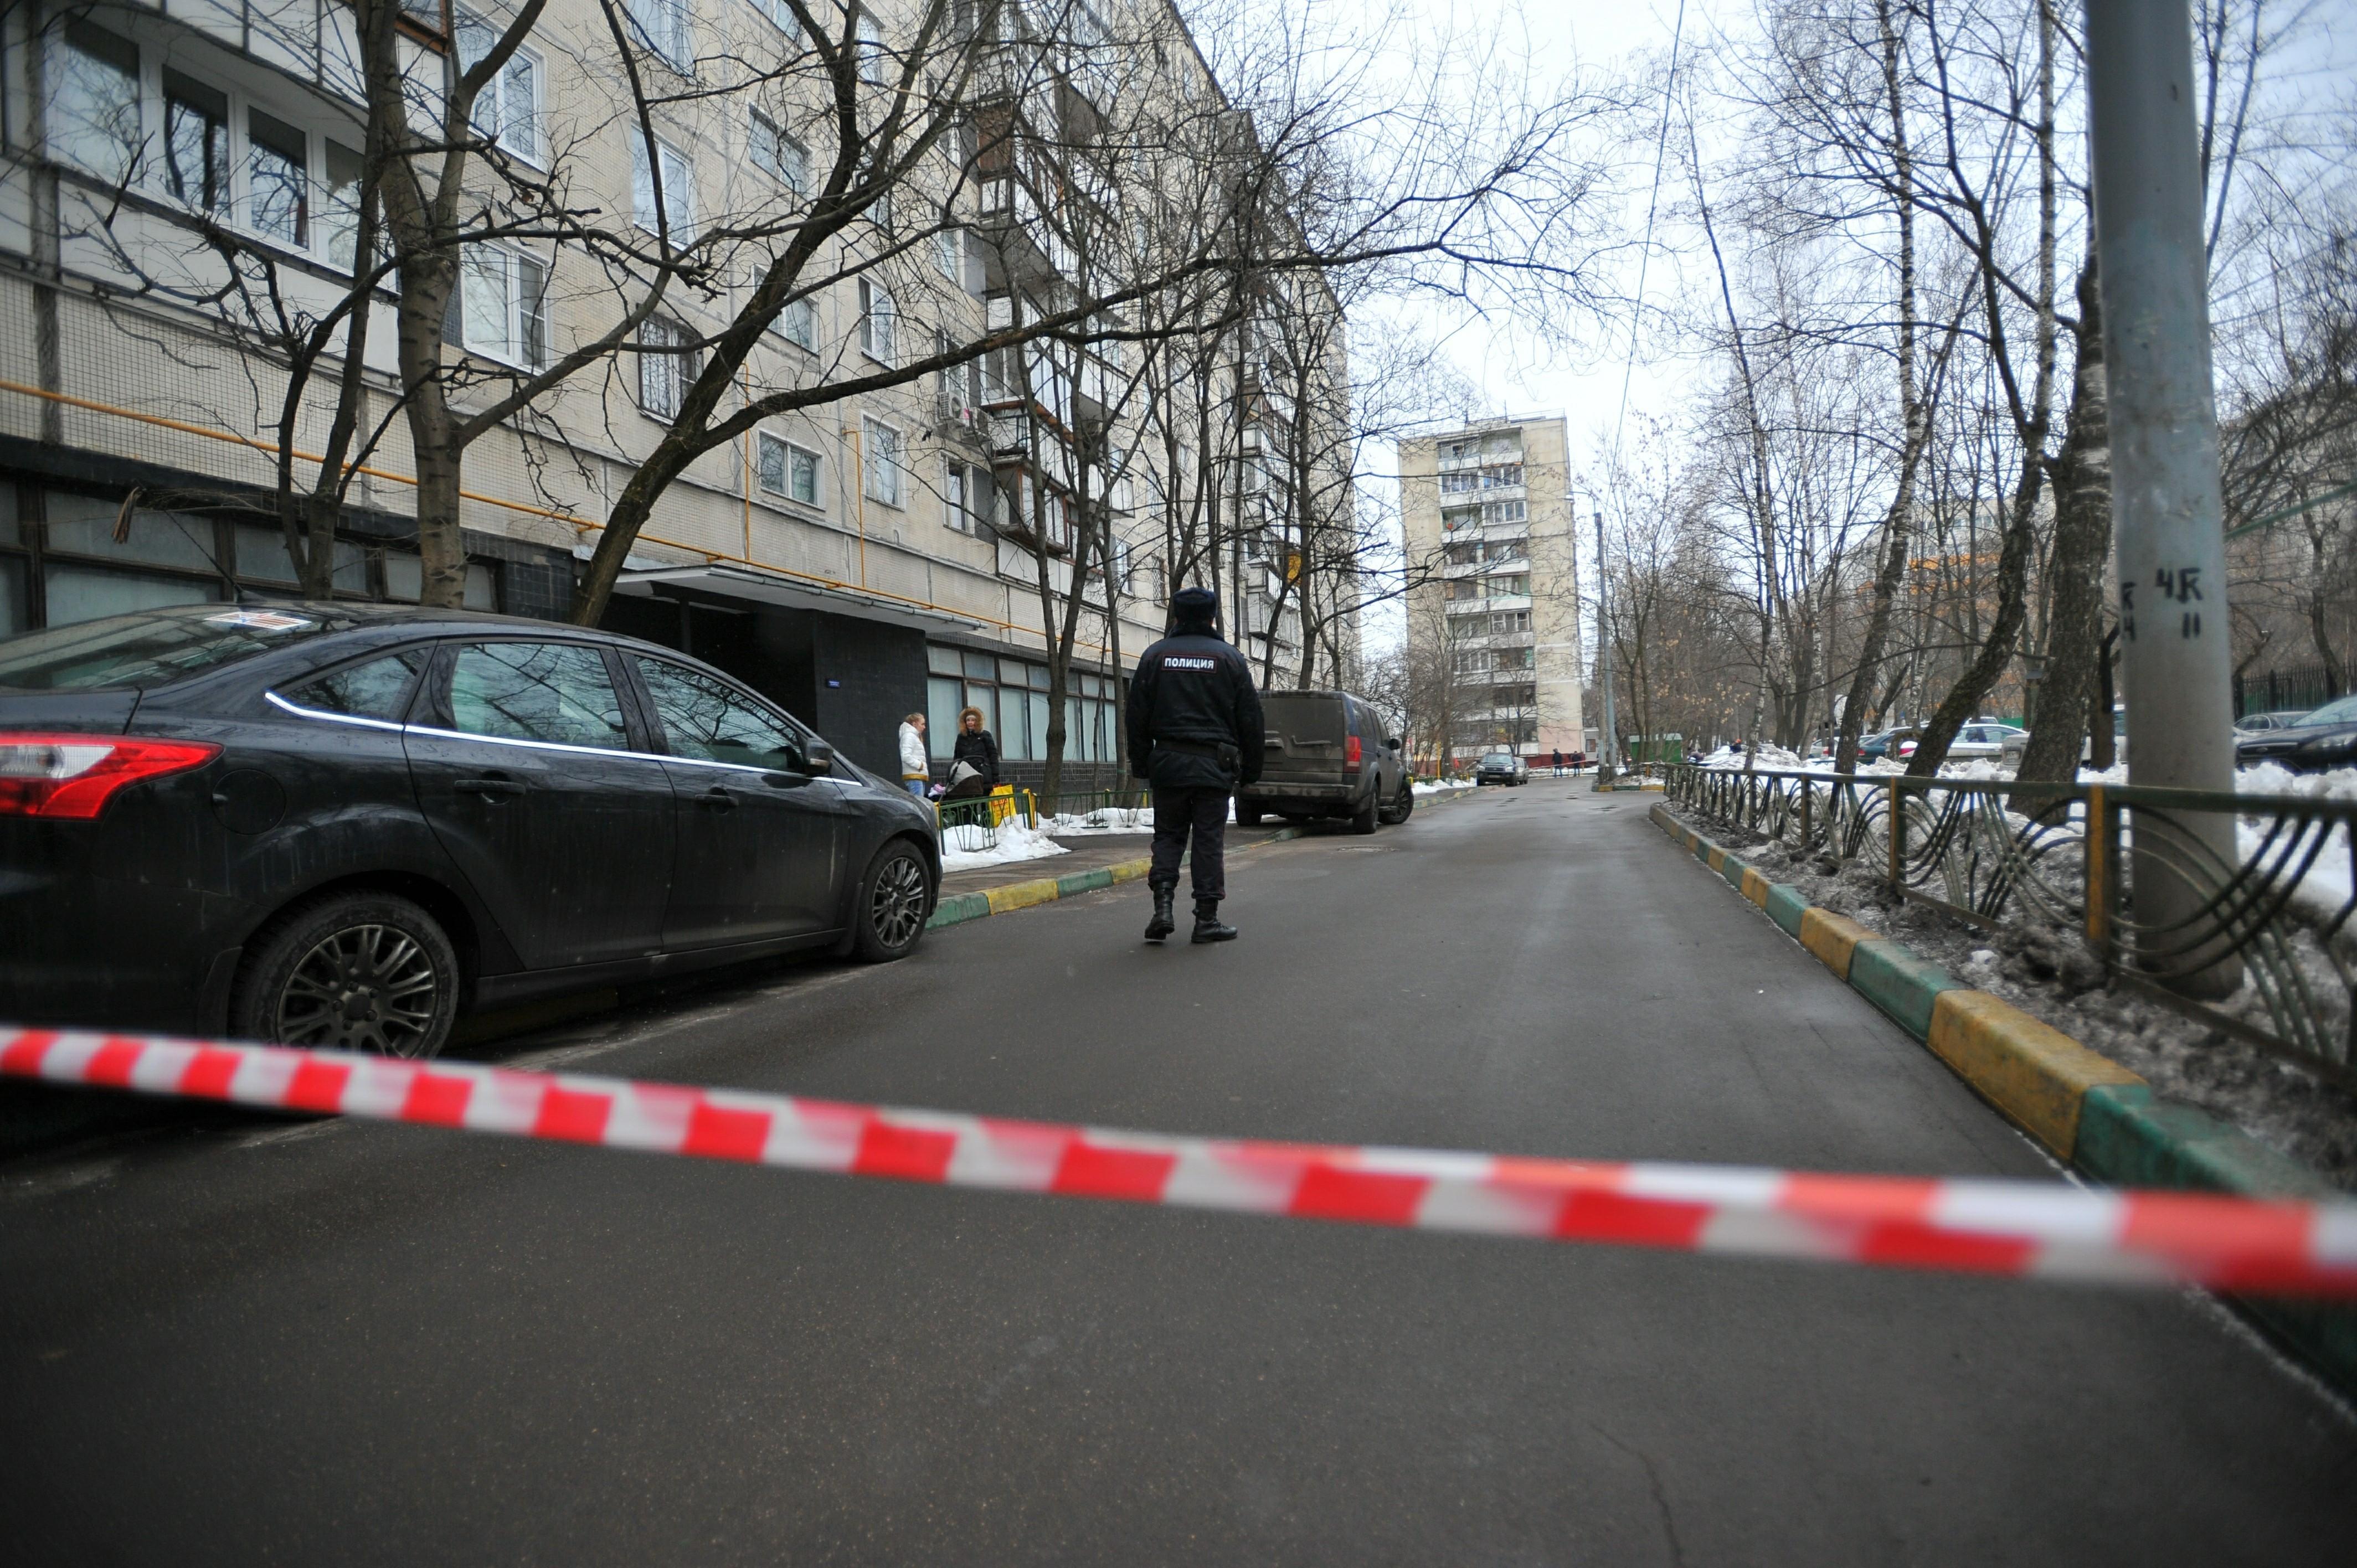 Федеральная судья выпала изокна пятнадцатого этажа вцентре Волгограда